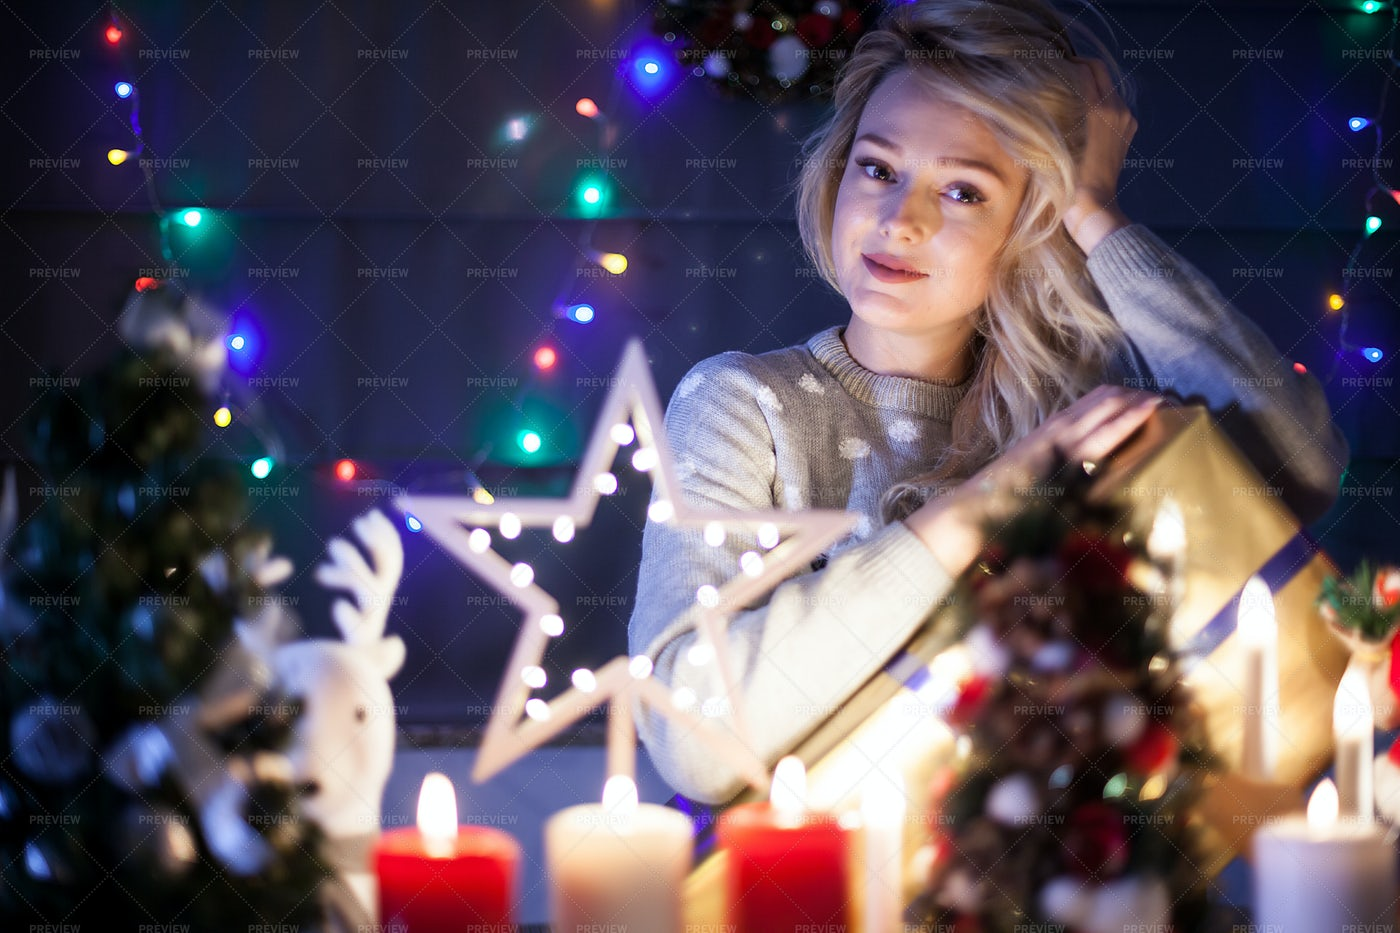 Girl Having A Warm Christmas Night: Stock Photos